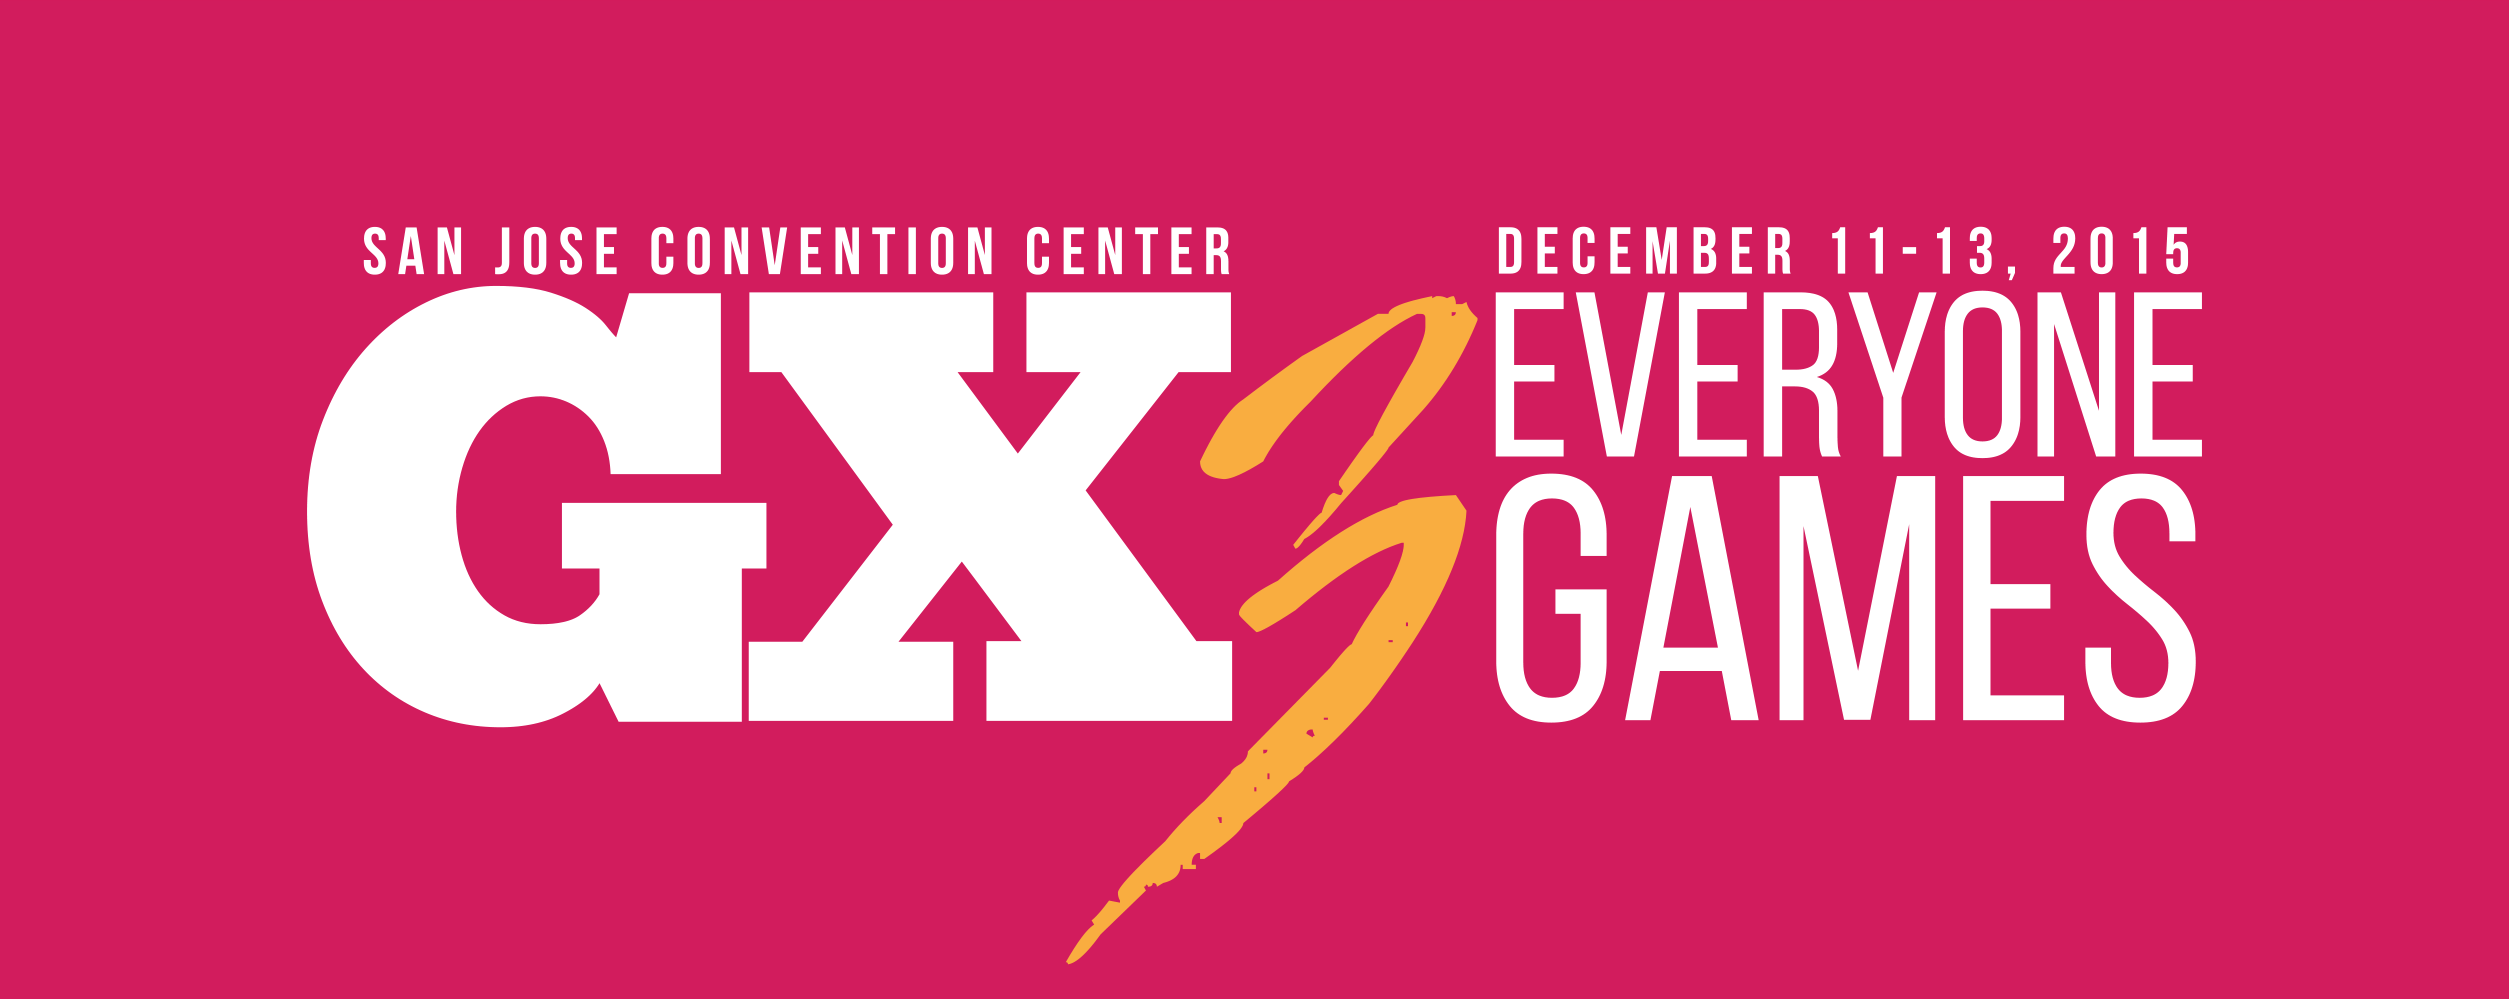 gx3-logo-pinkbanner